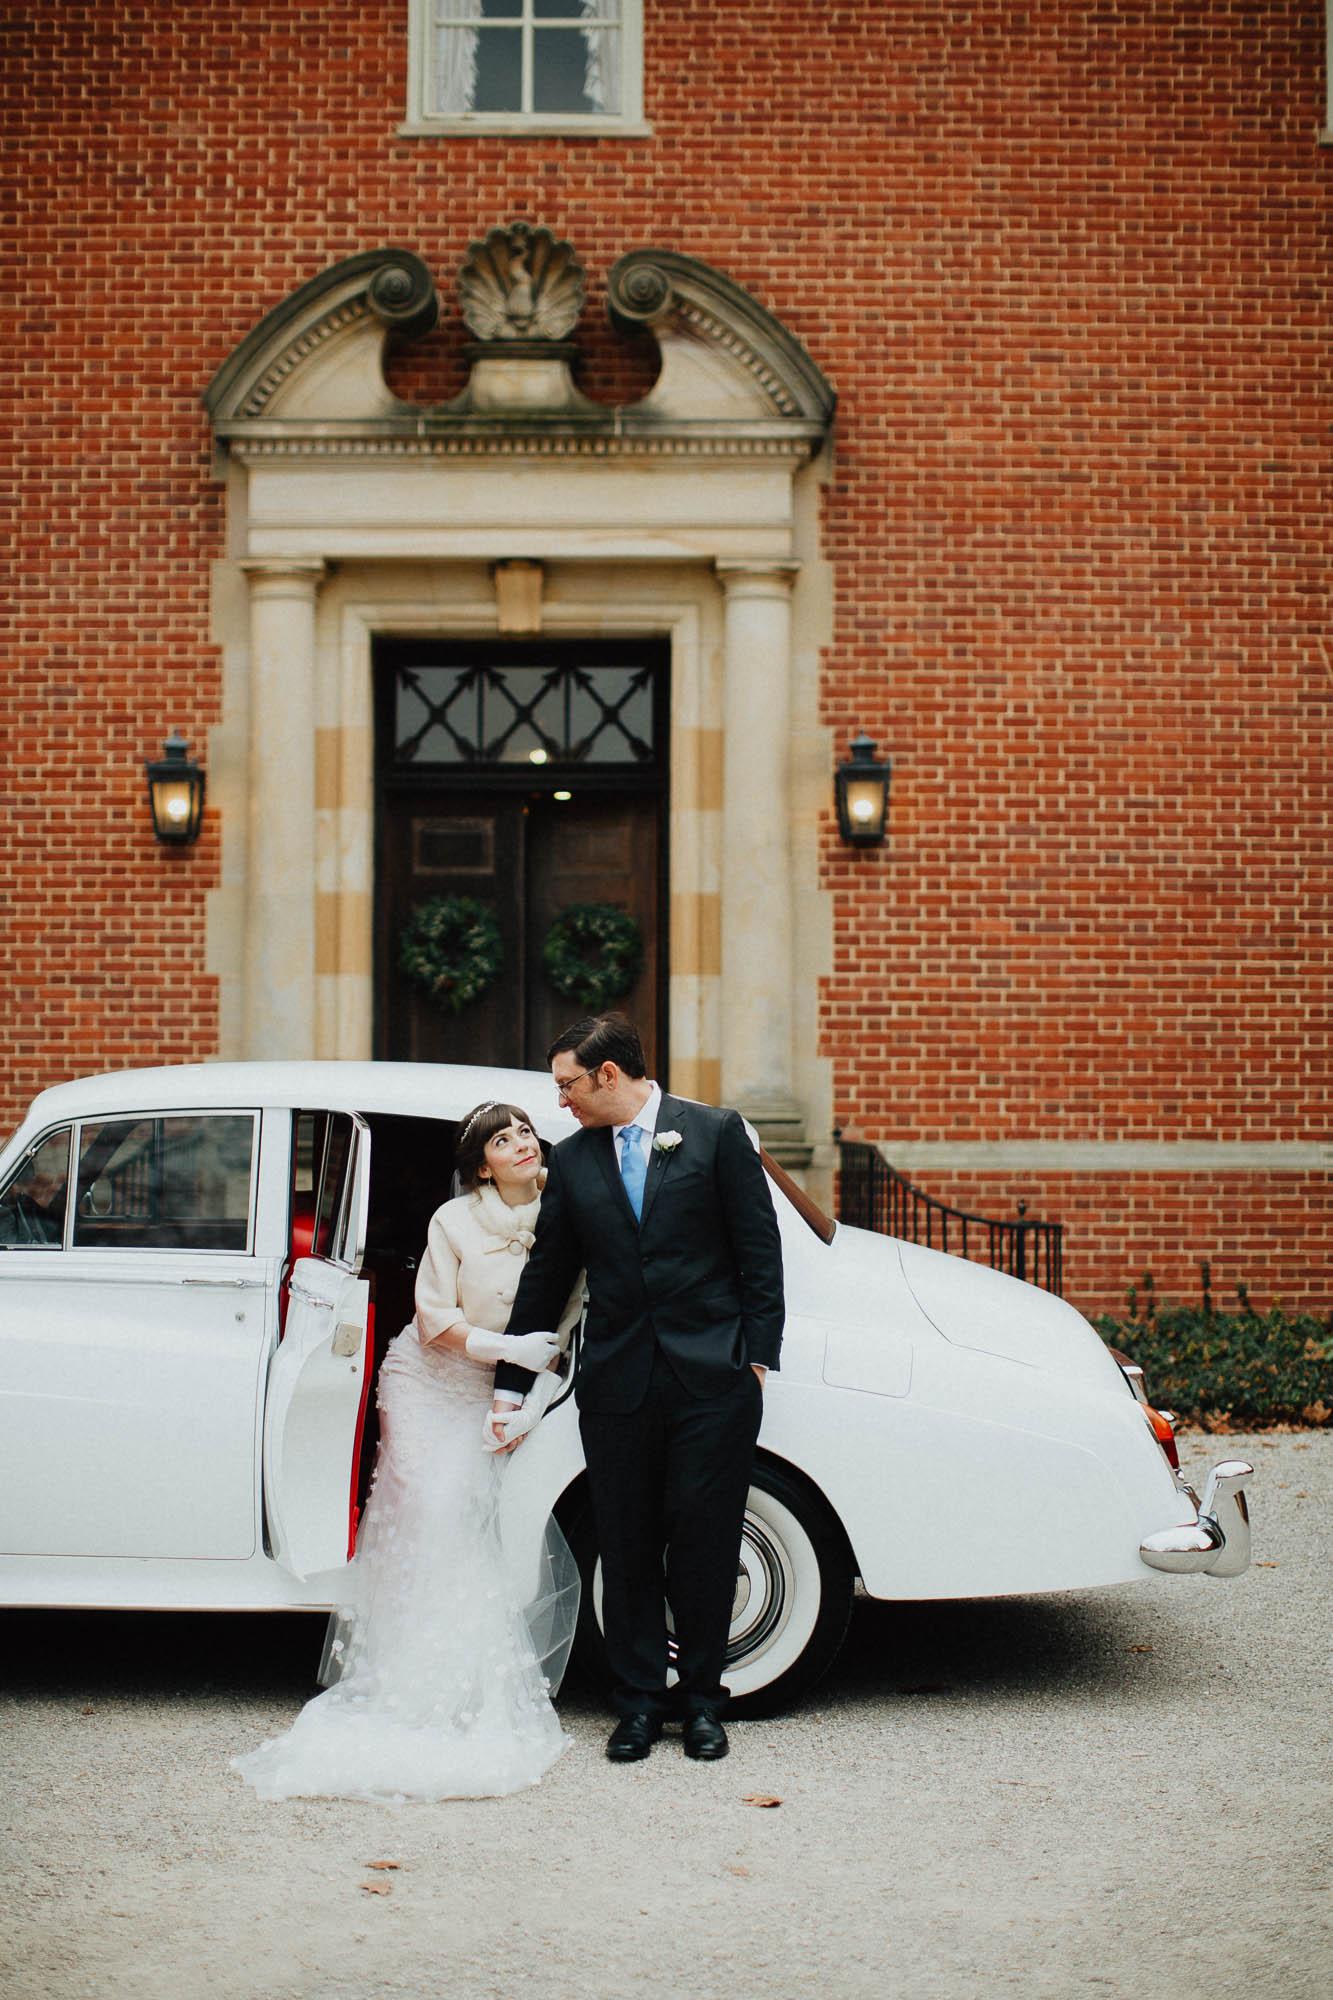 Claudia-Stephen-Peterloon-Wedding-Cincinnati-Ohio-053.jpg